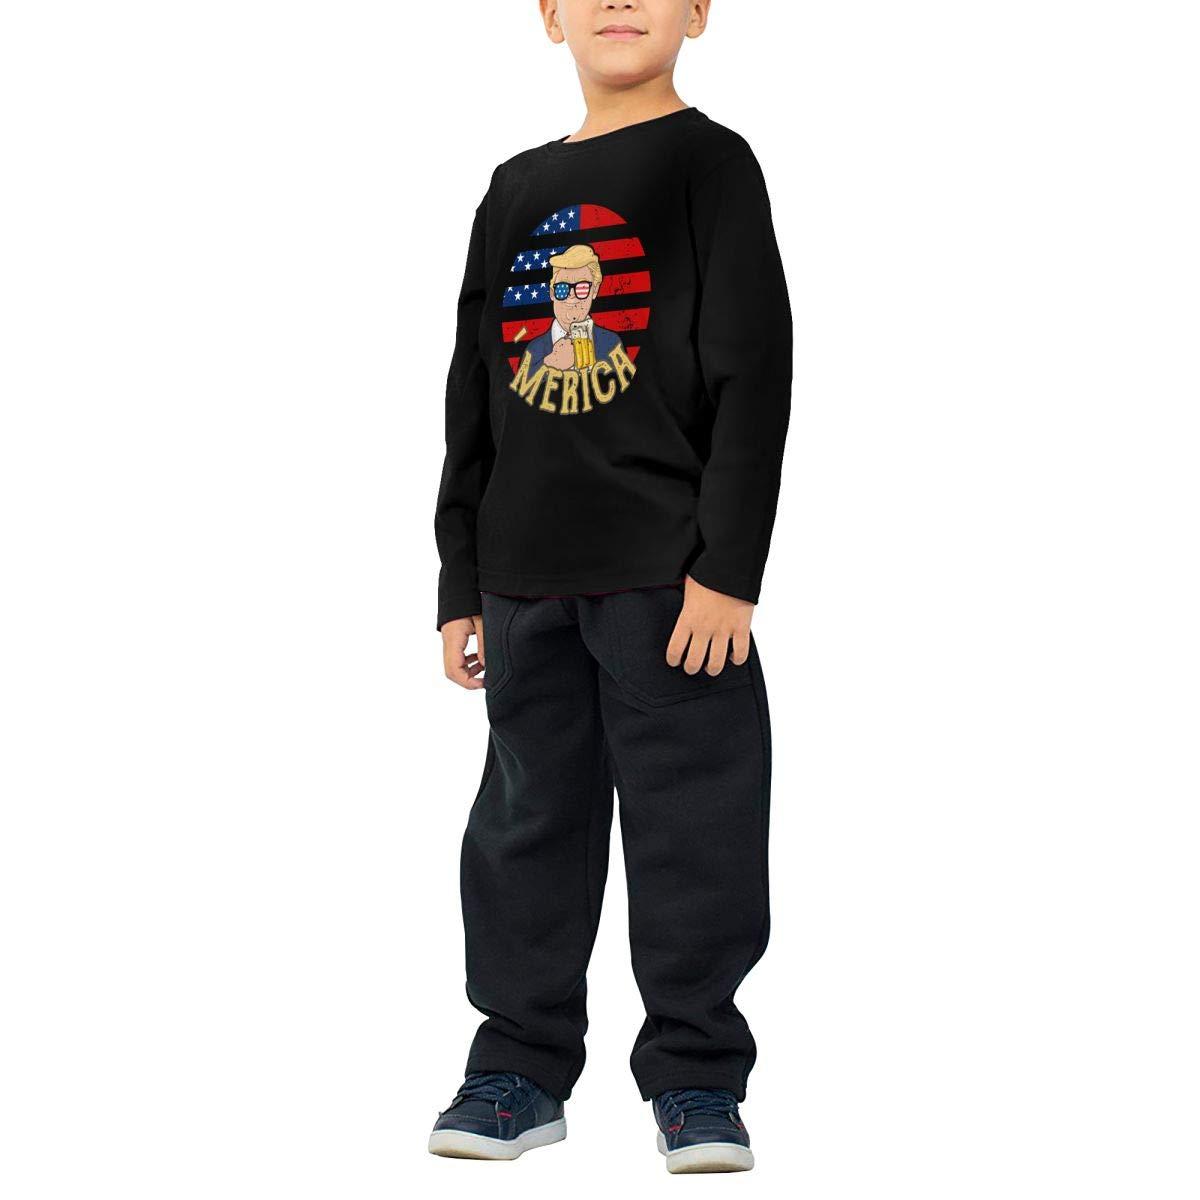 Trump 2020 Childrens Long Sleeve T-Shirt Boys Cotton Tee Tops